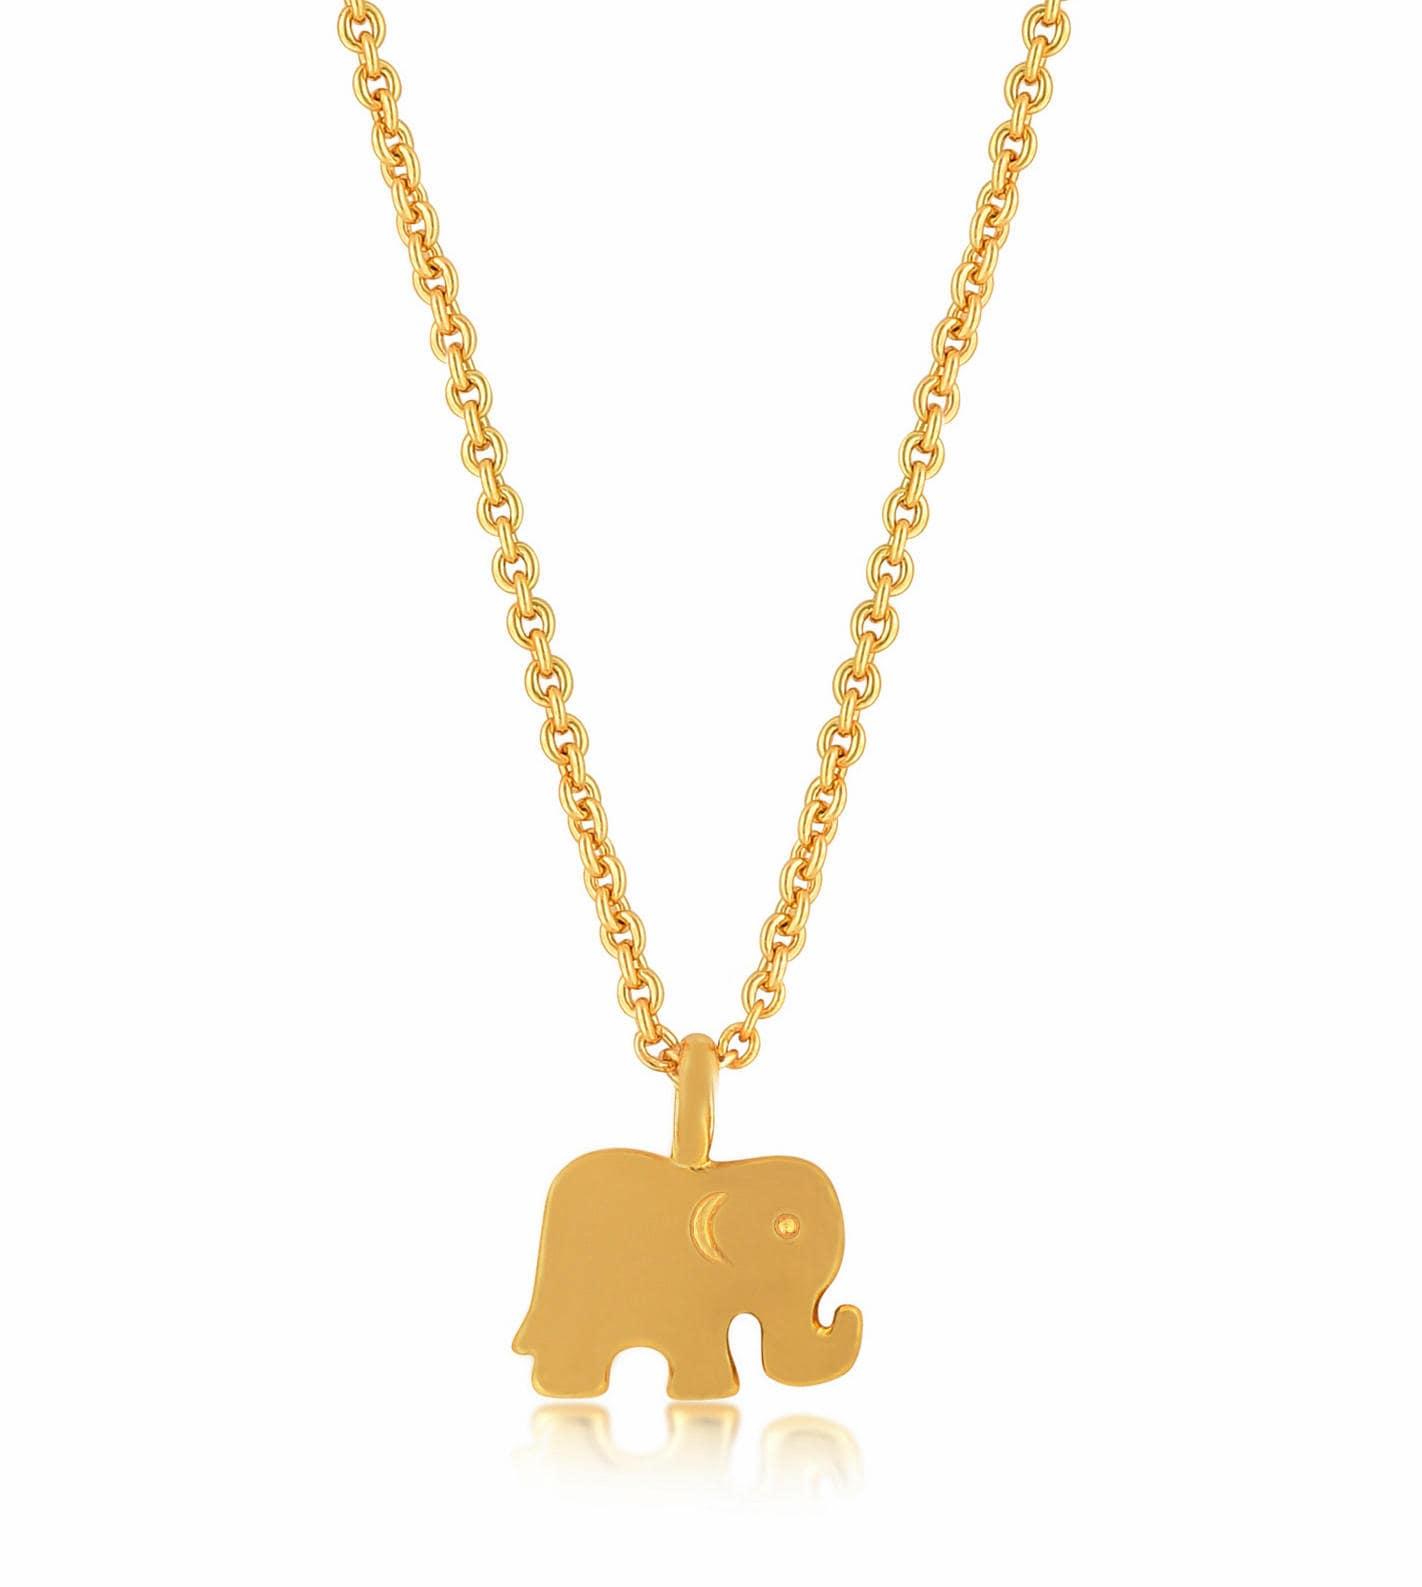 Elephant necklace gold elephant pendant necklace zoom aloadofball Gallery